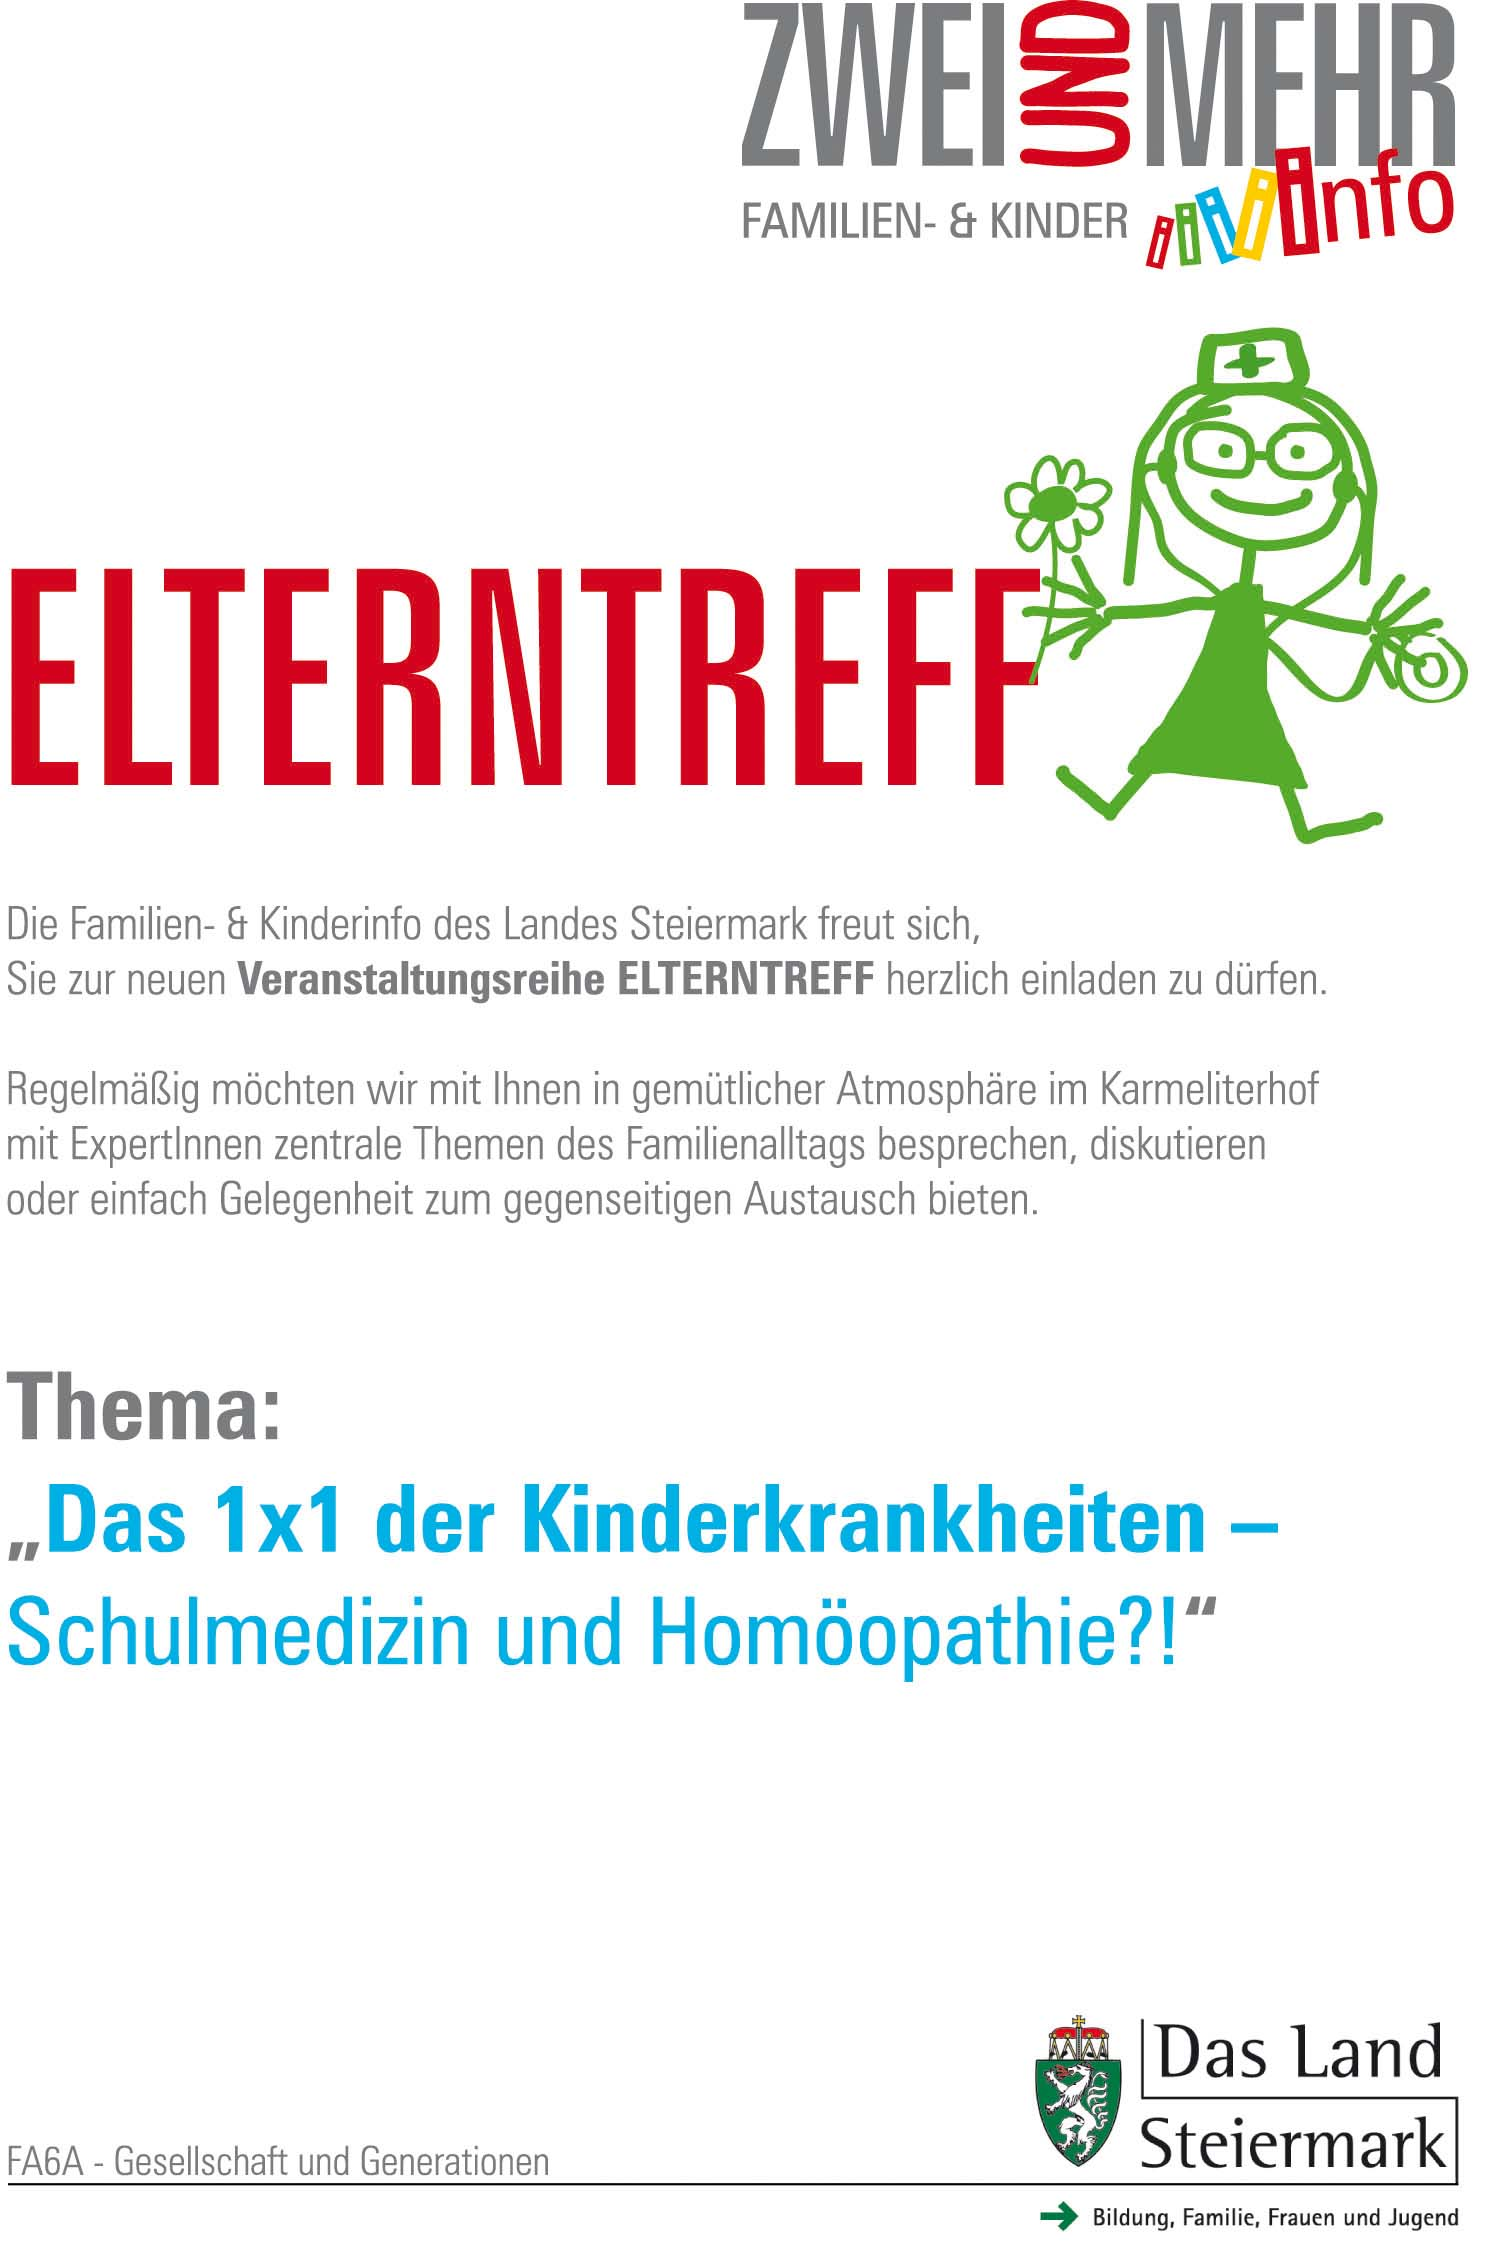 16. November 2011 - Verwaltung - Land Steiermark